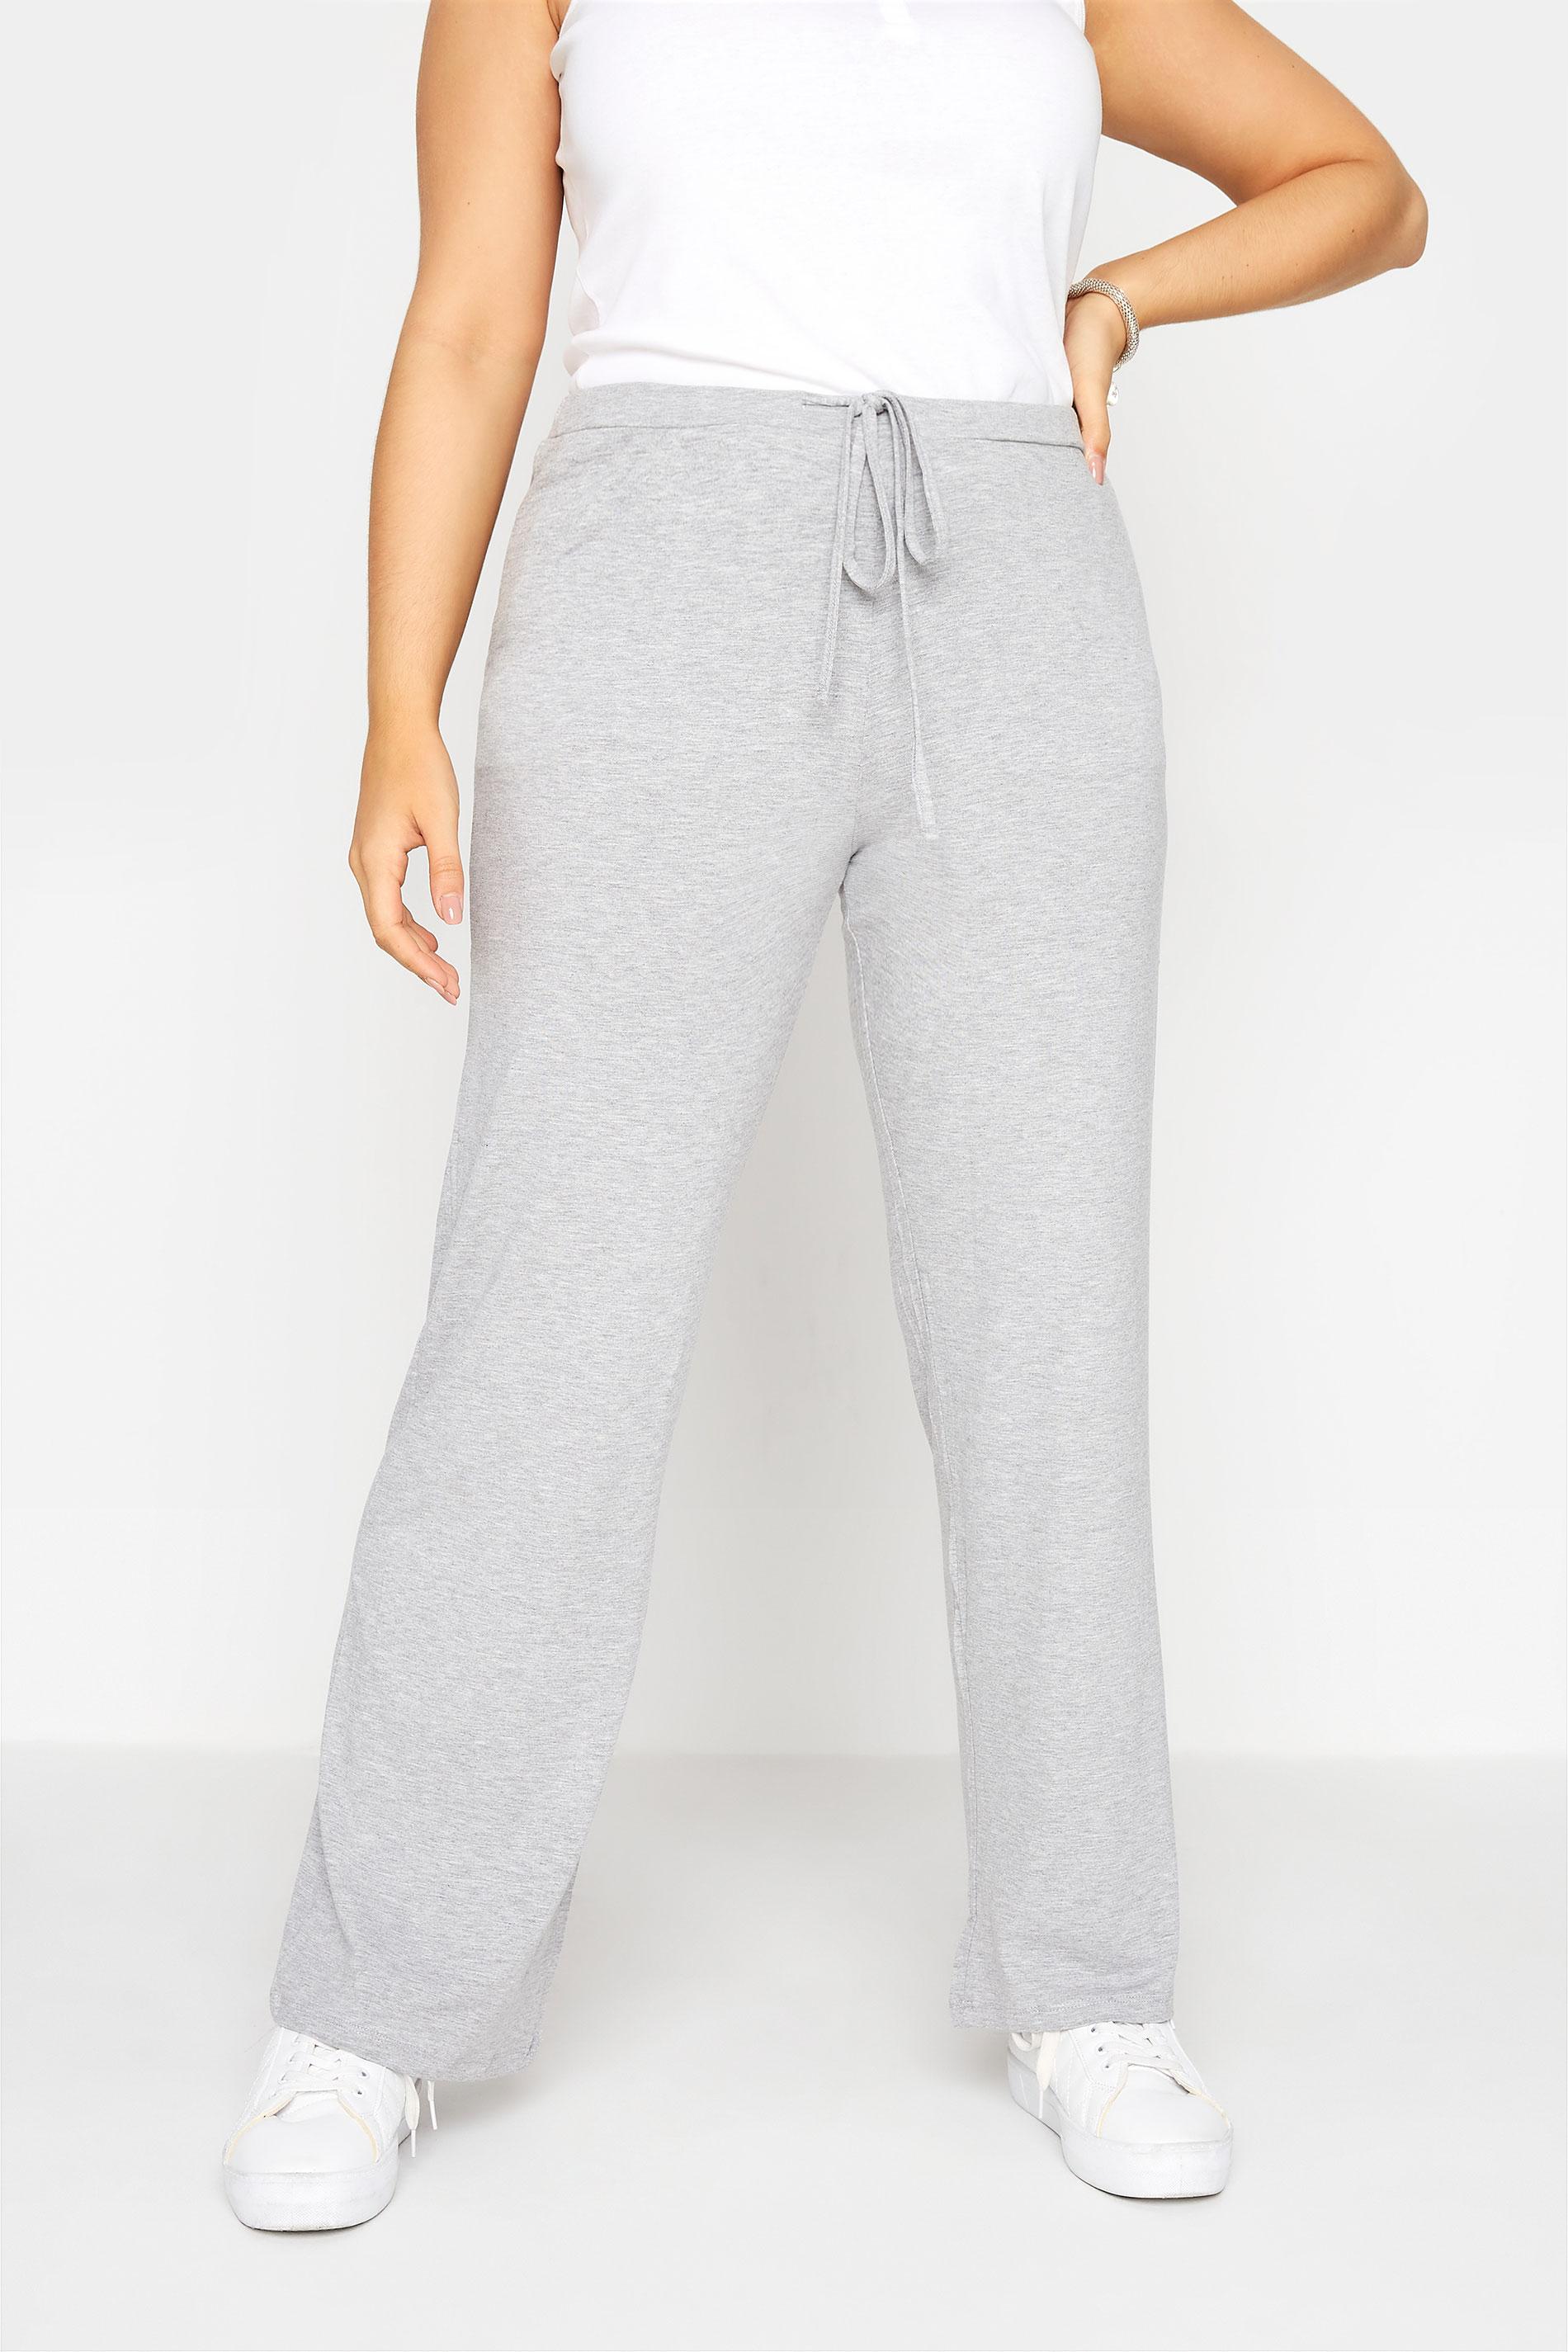 Grey Wide Leg Pull On Stretch Jersey Yoga Pants_B.jpg